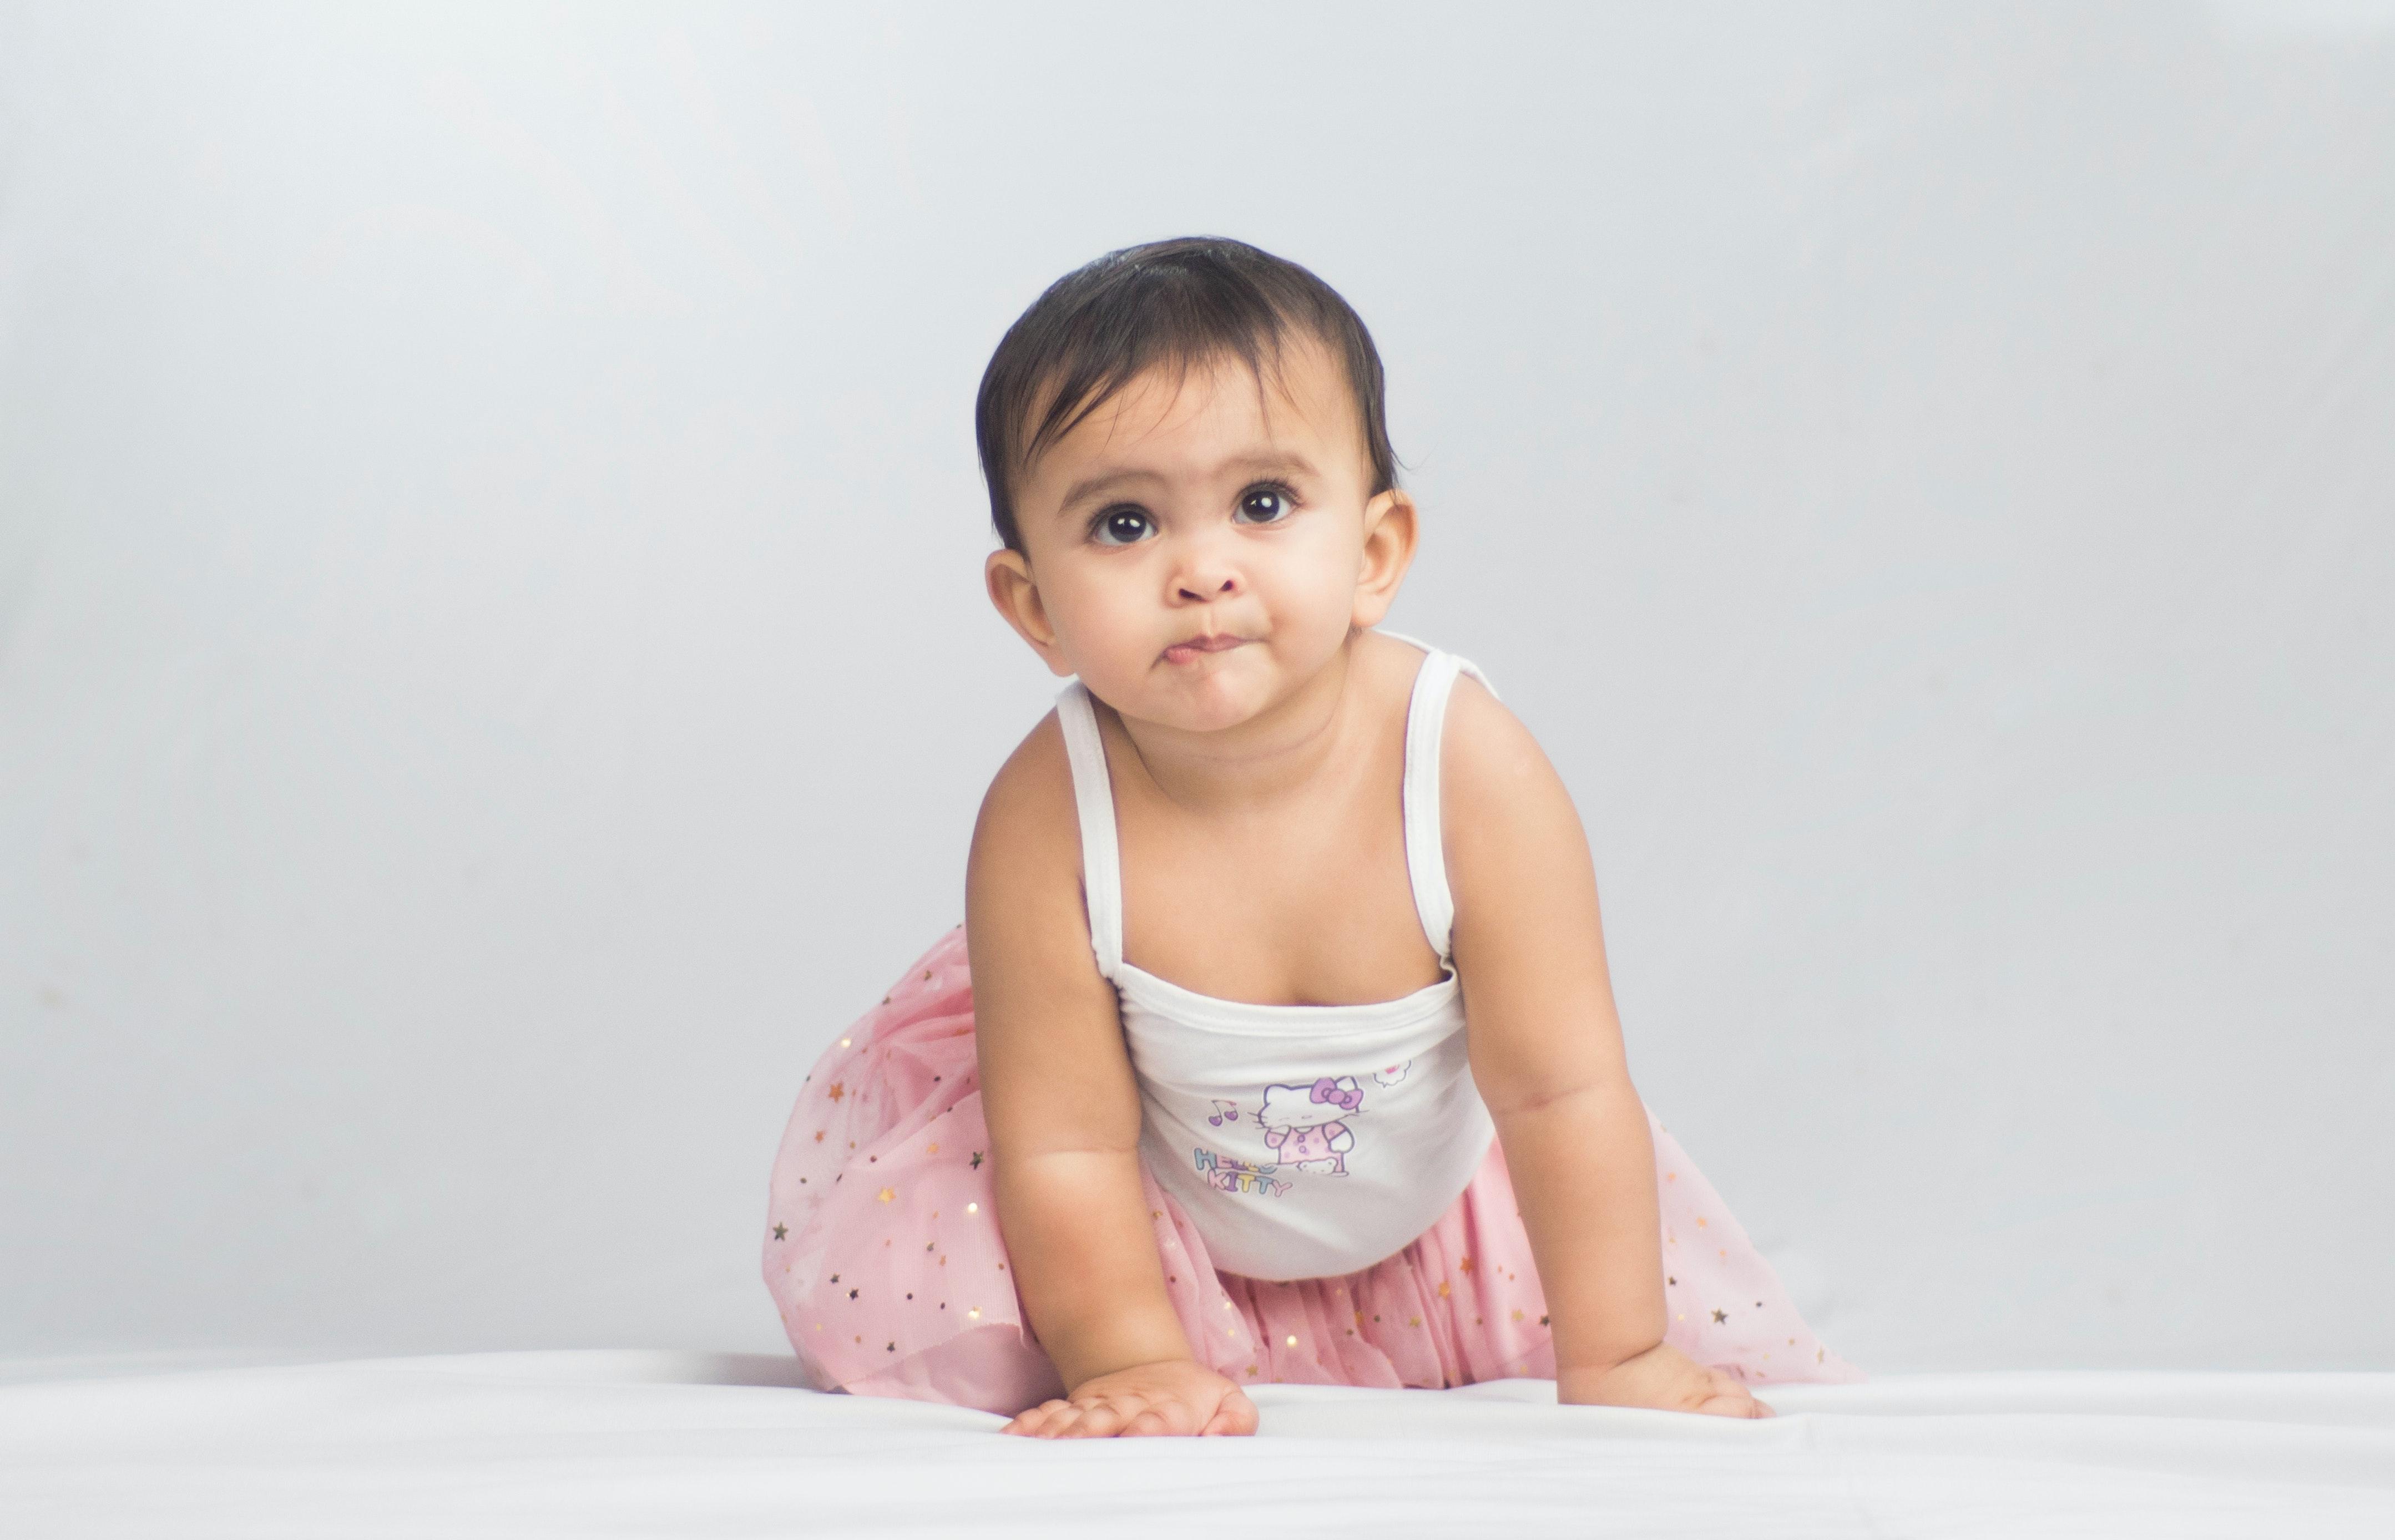 caf3ccd006d4a6 Gratis stockfoto van baby